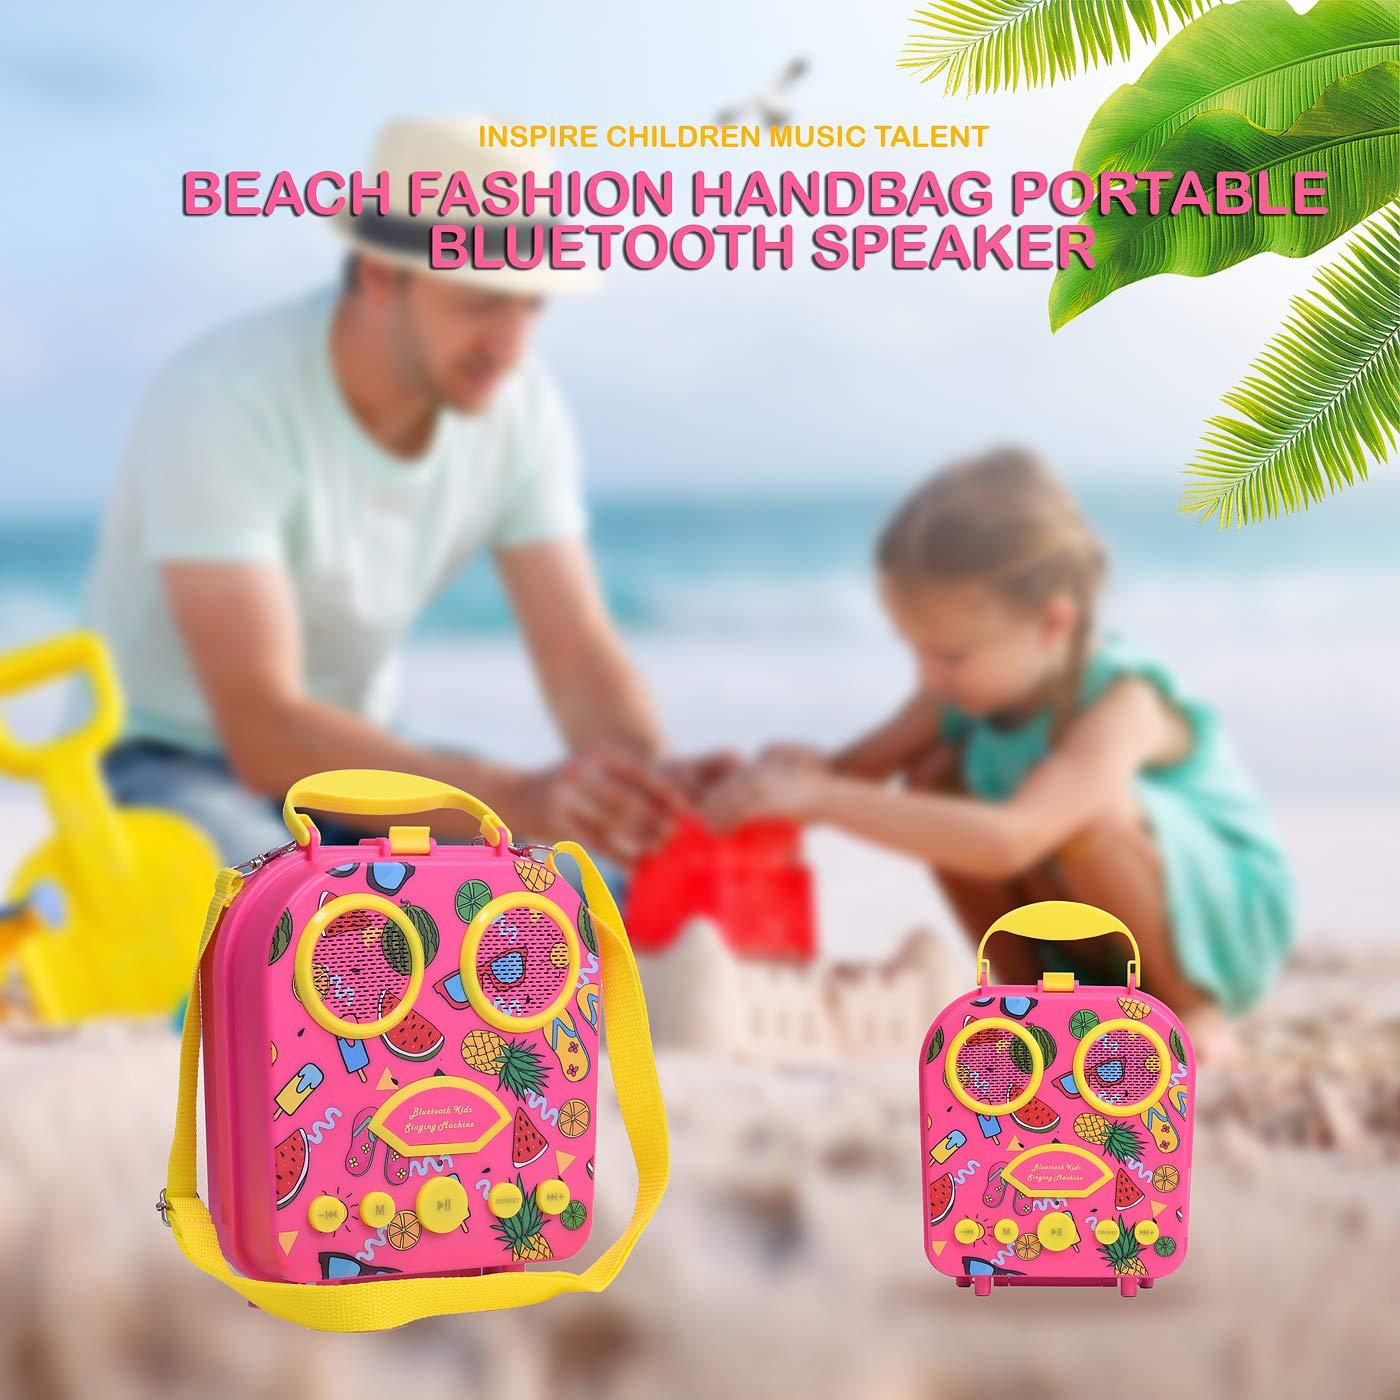 Bluetooth Speaker Children's Karaoke Speaker Portable Microphone Beach Handbag Karaoke Bluetooth Speaker Wireless Cartoon Speaker for Kids for Indoor Outdoor Travel Activities with Microphone (Pink) by HowQ (Image #7)